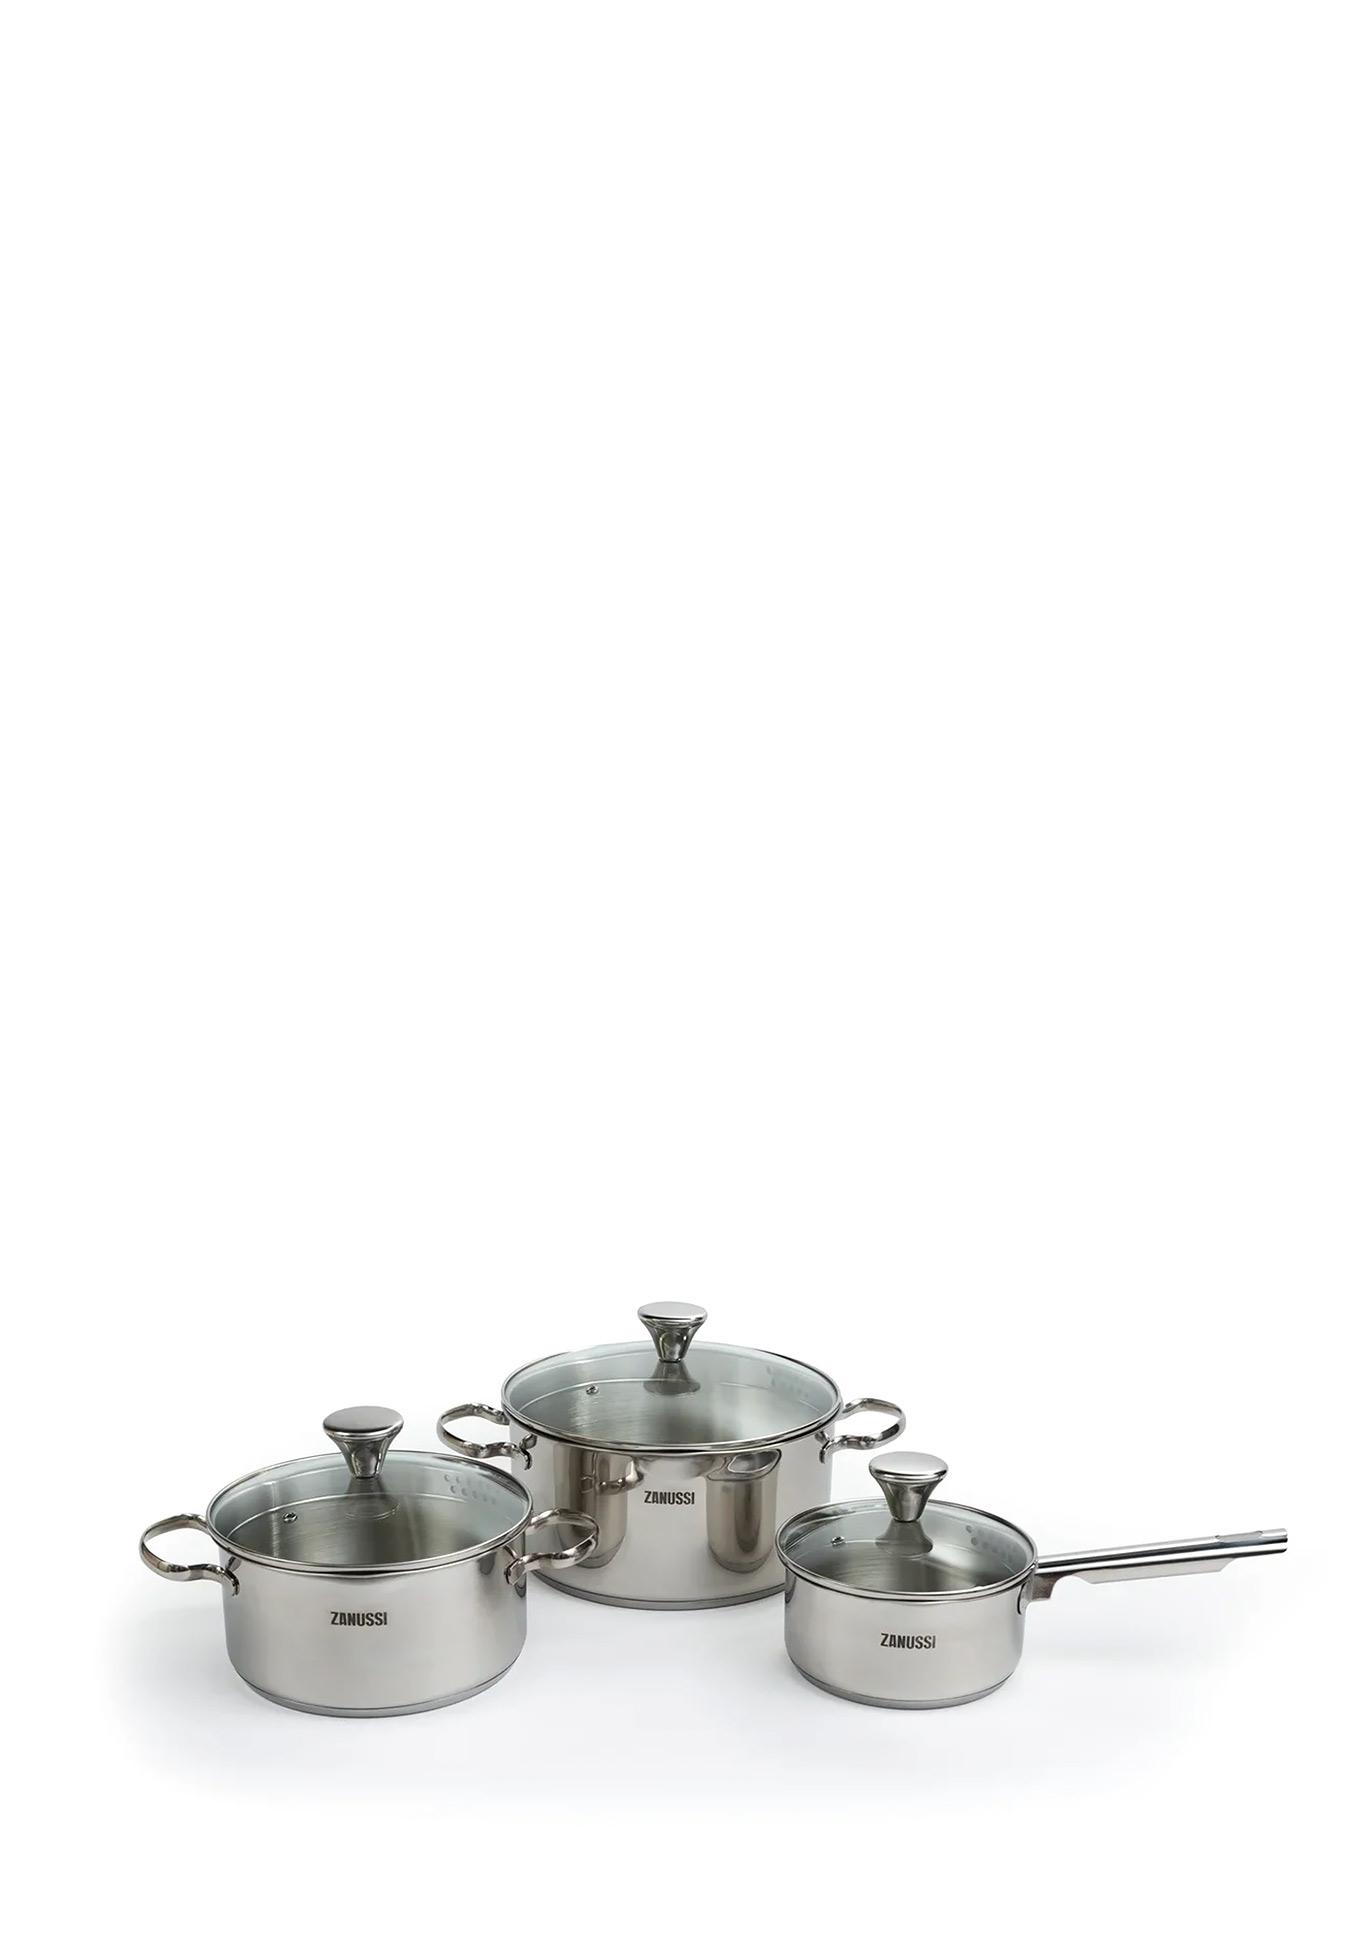 ghali padova Zanussi Набор посуды Padova, 6 предметов